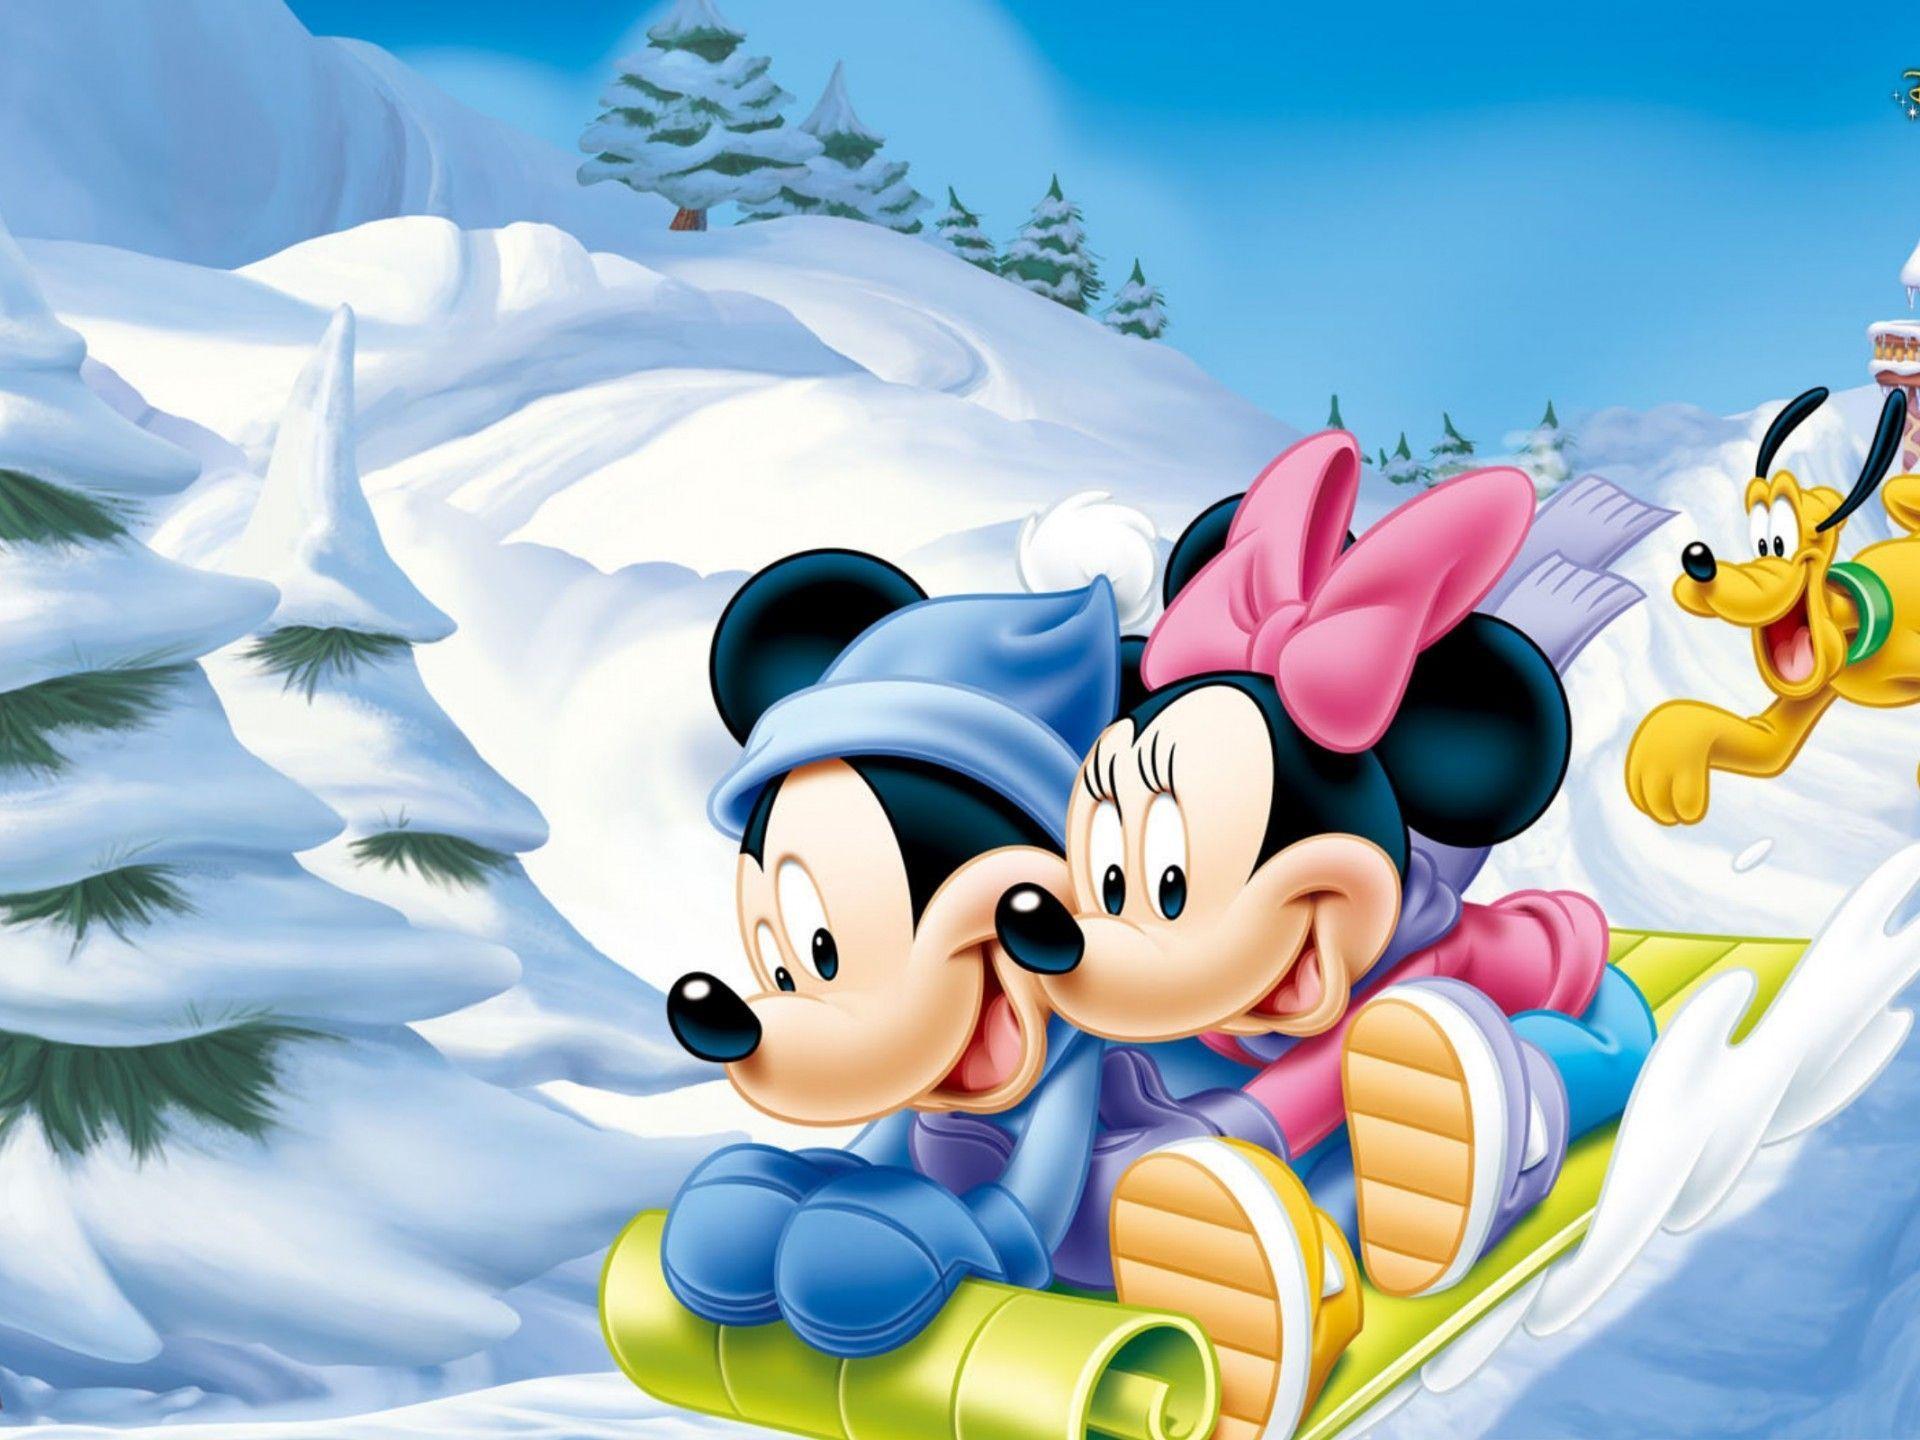 Disney Cartoon HD Wallpapers For Desktop - Wallpaper Cave